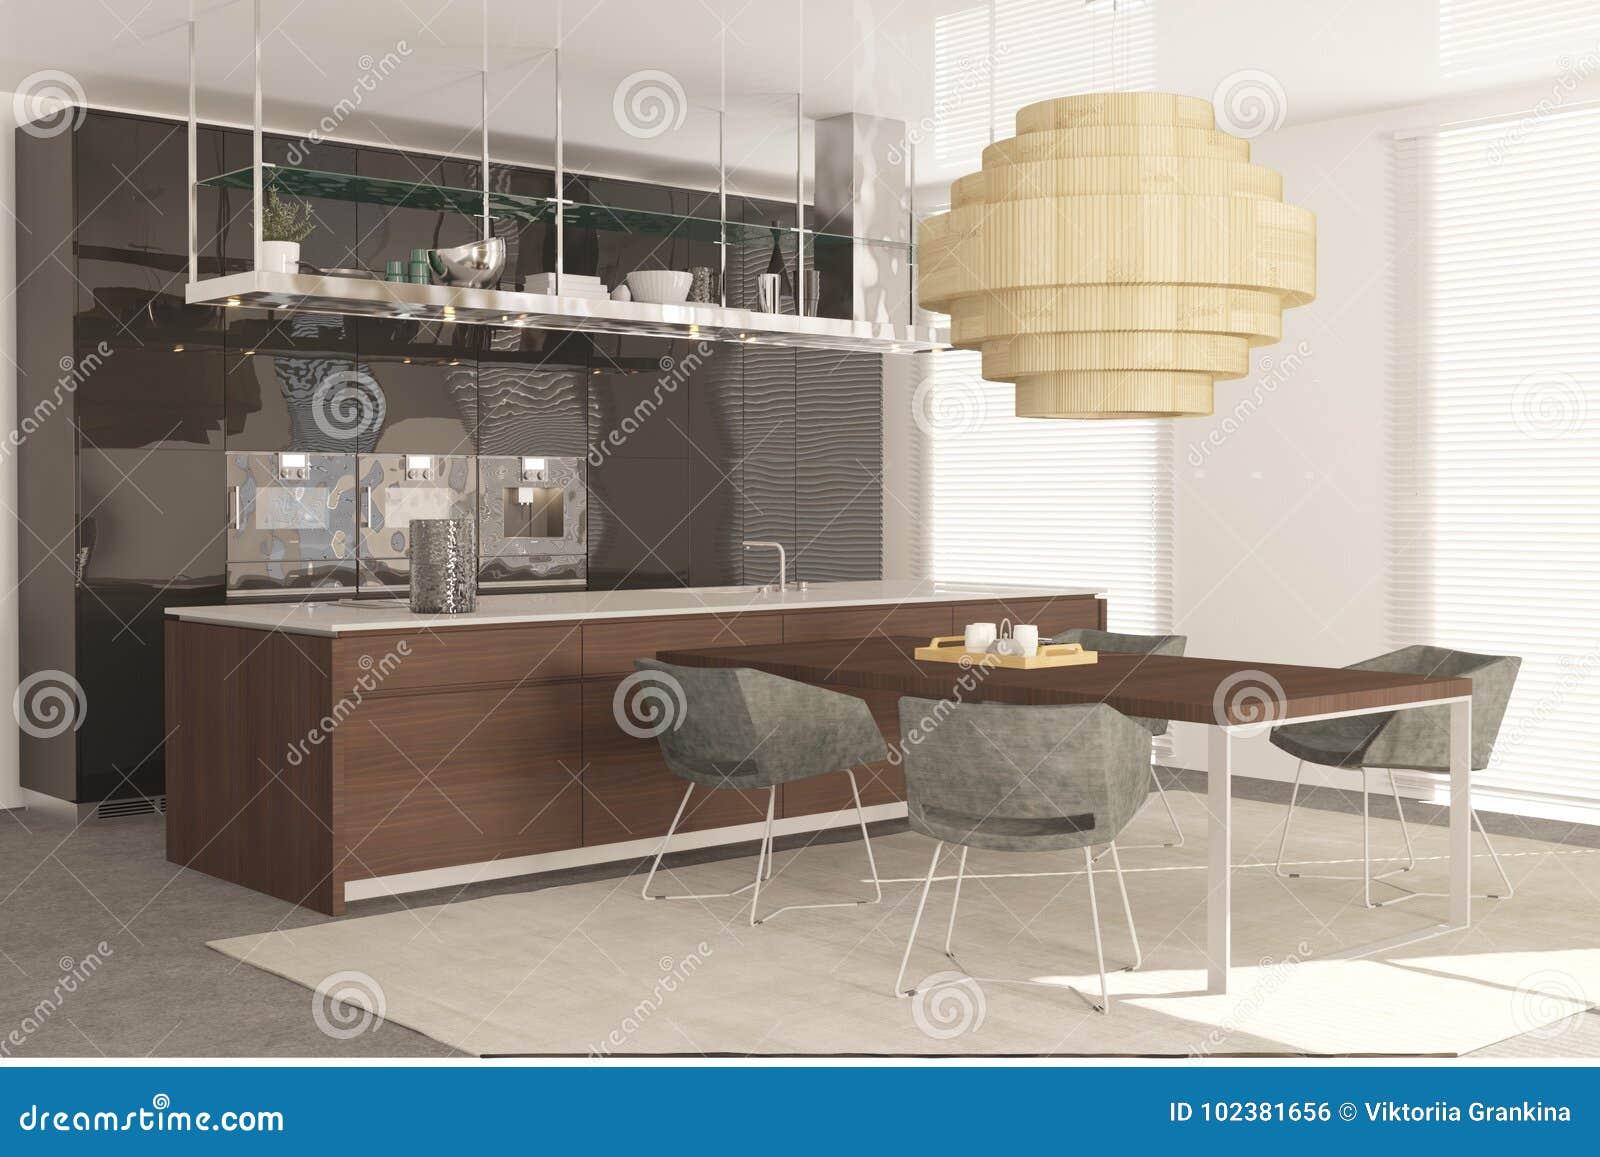 Armario De Cocina Moderno Con Comedor Stock de ilustración ...